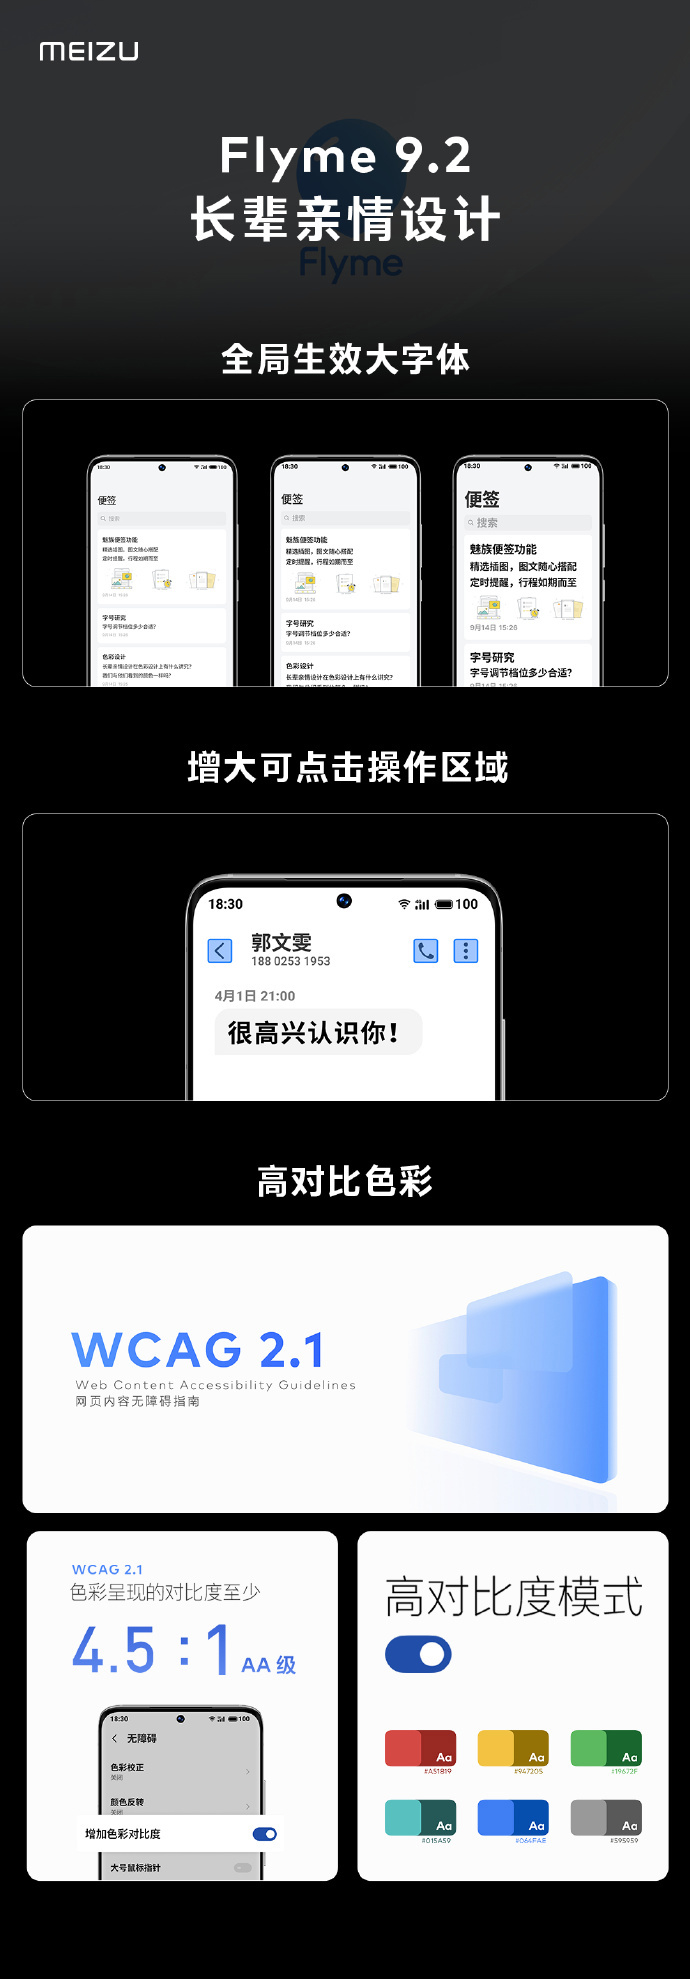 Meizu Flyme 9.2